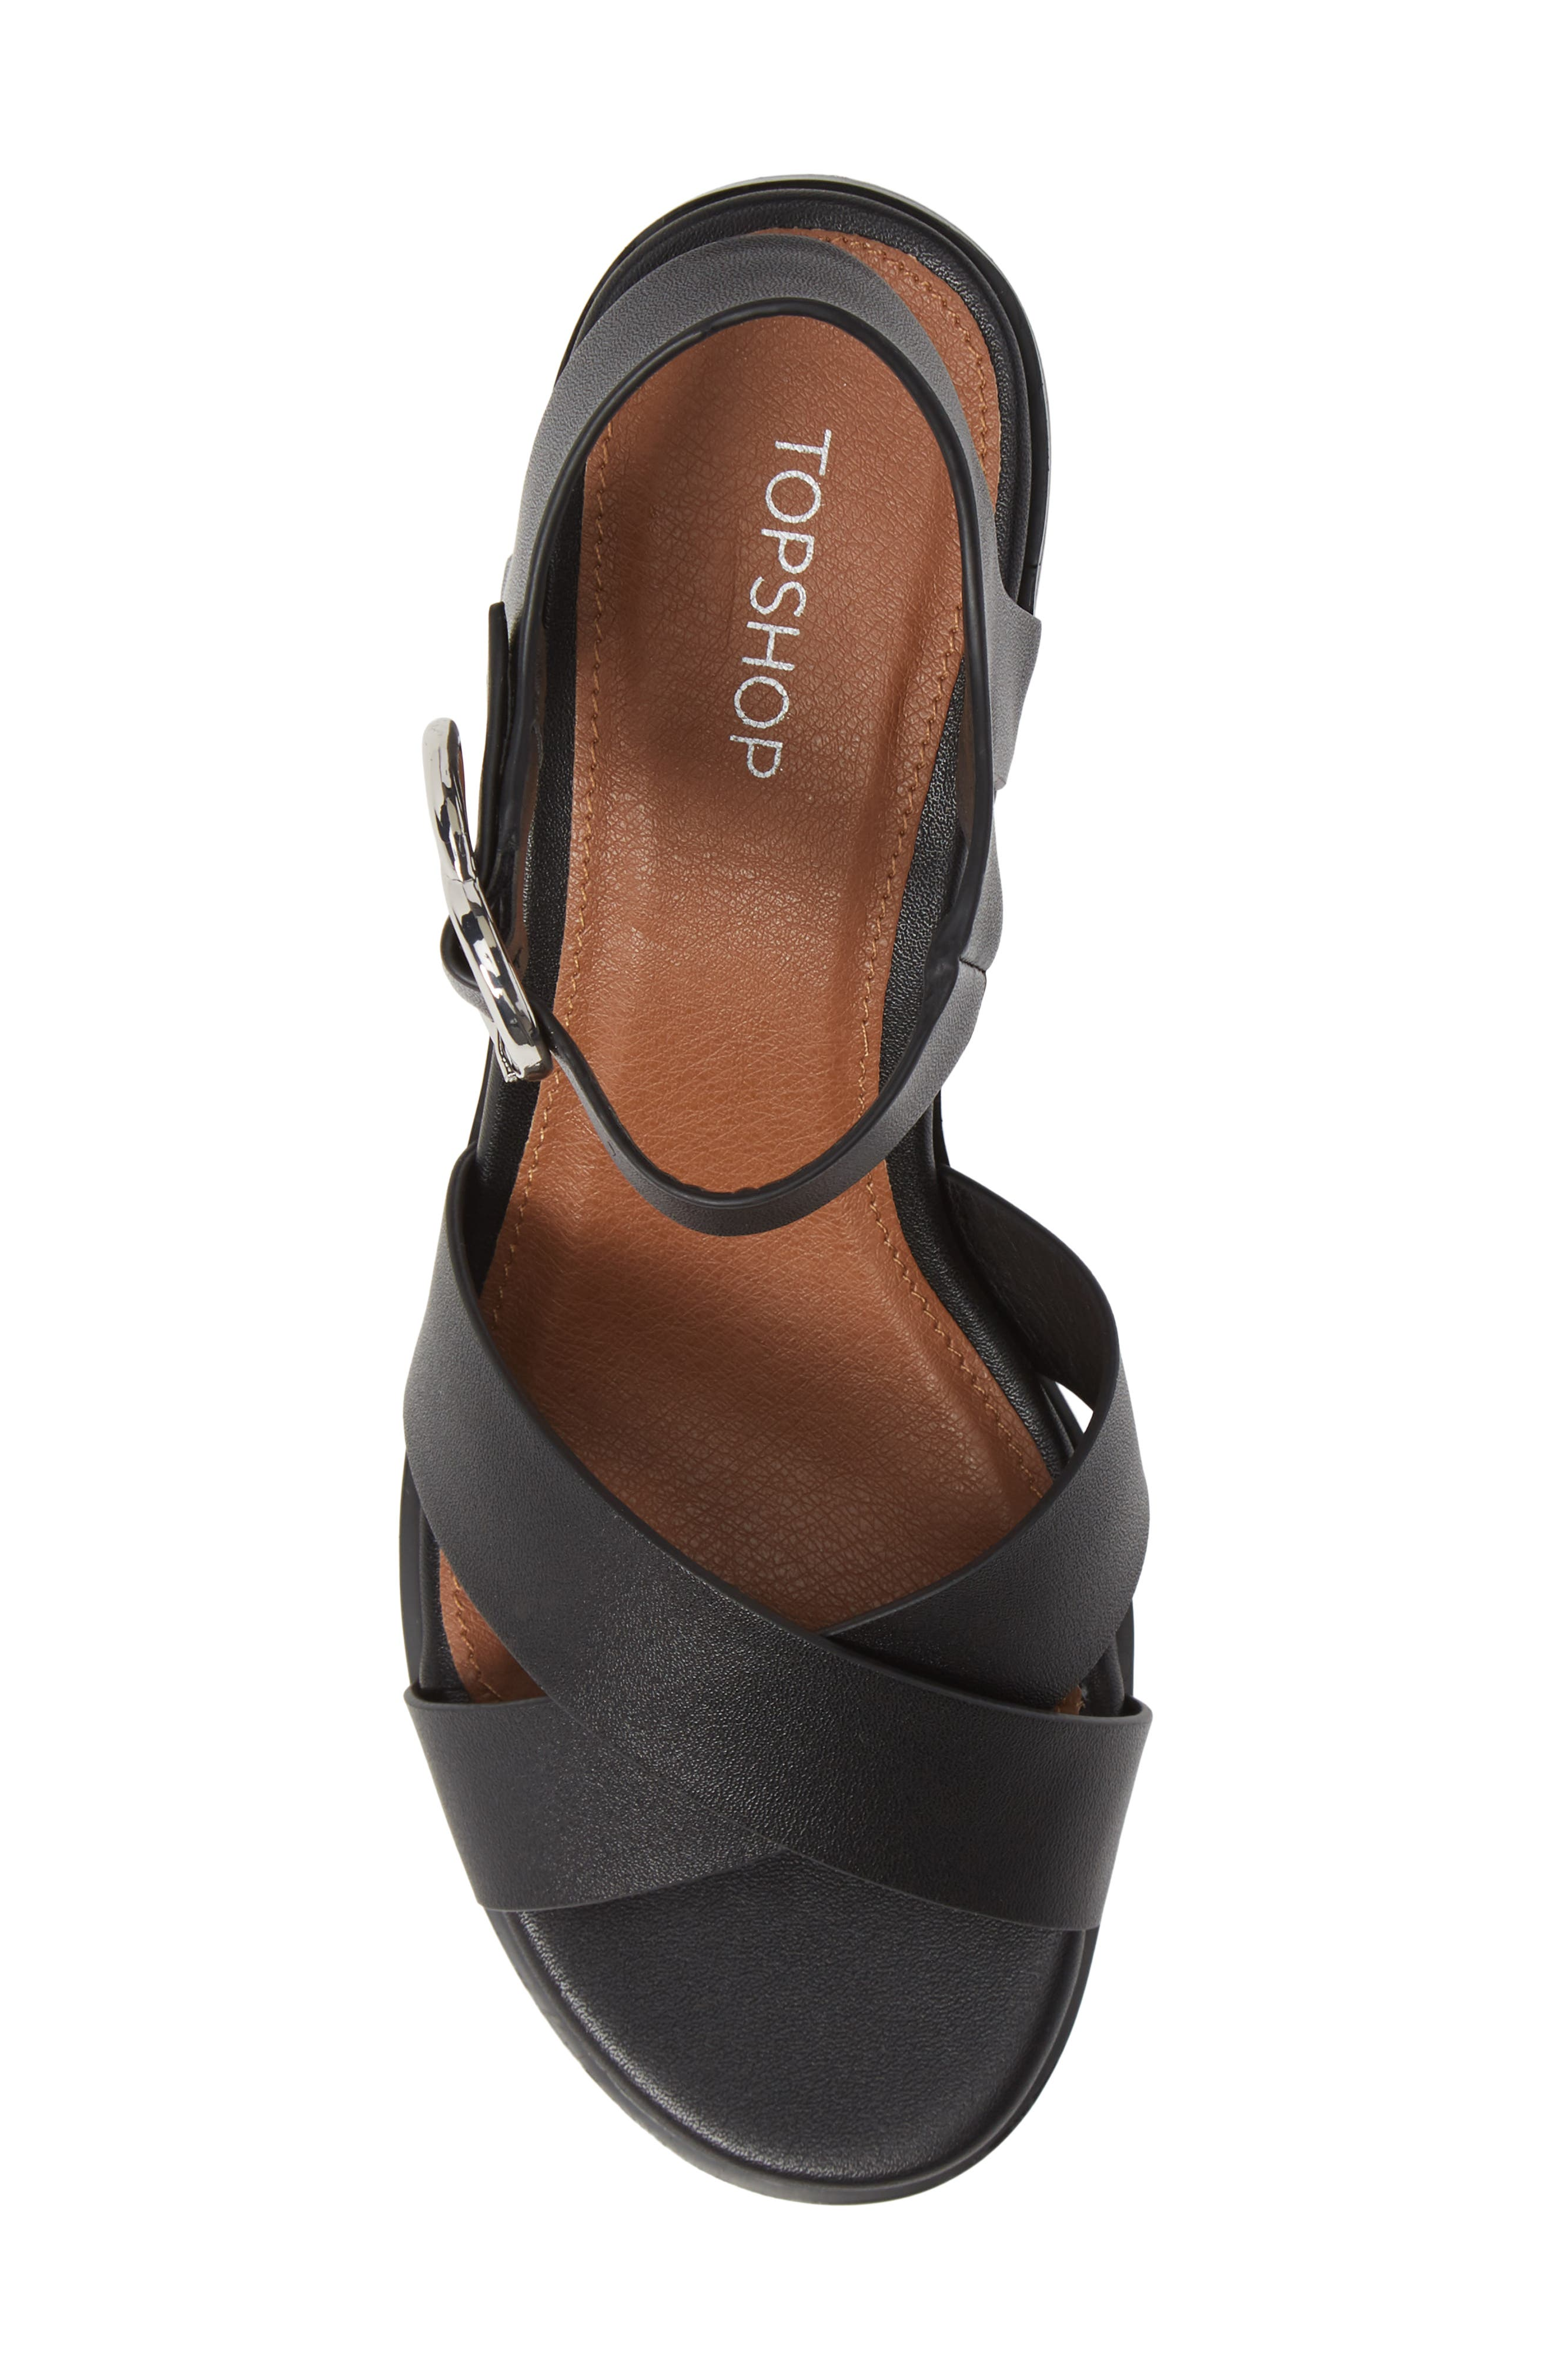 Deedee Block Heel Sandal,                             Alternate thumbnail 5, color,                             001